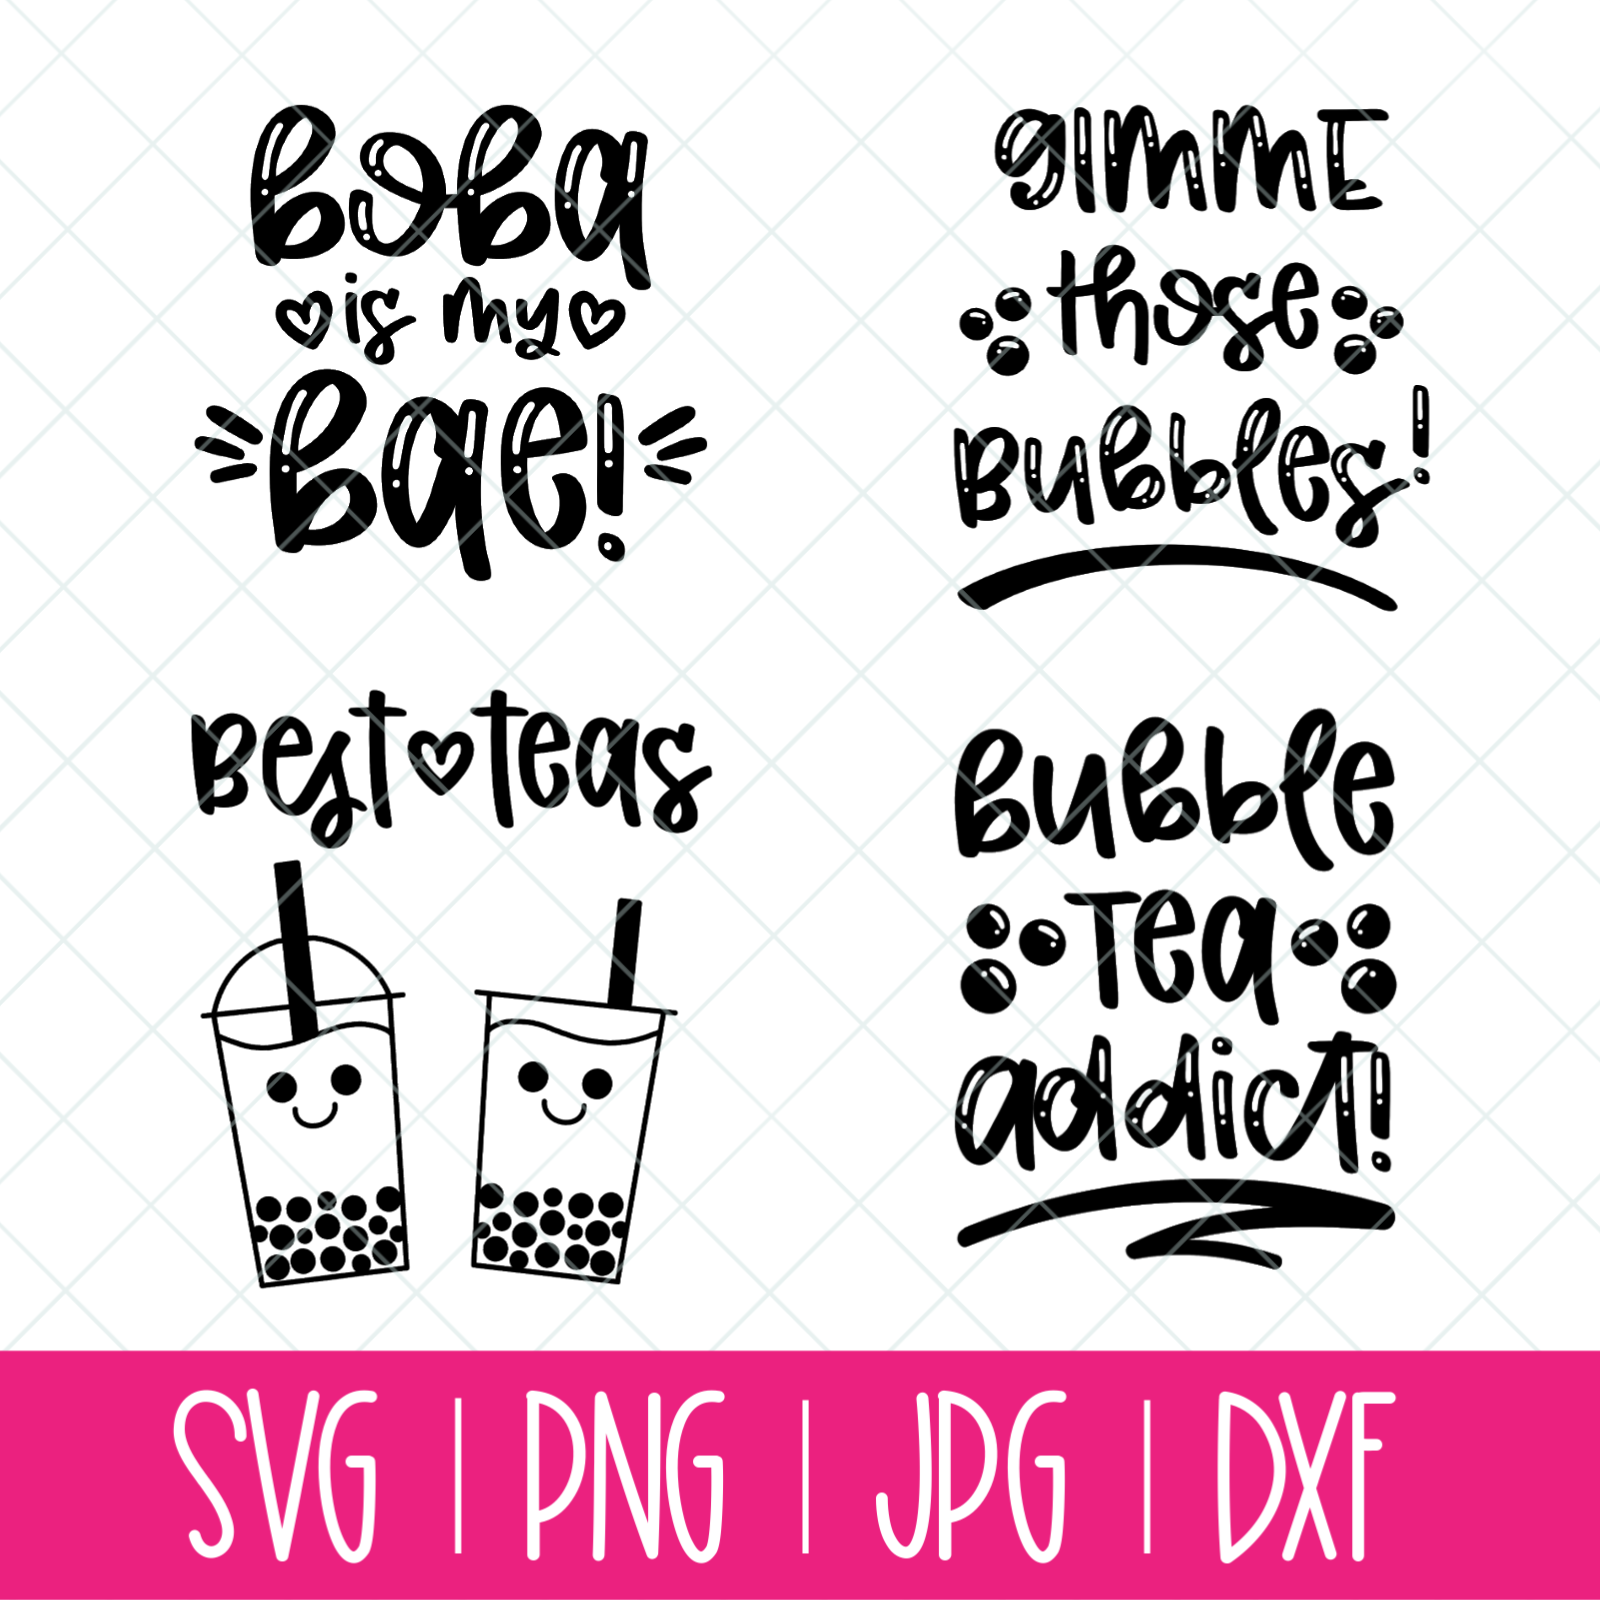 Bubble Tea Svg Bundle 4 Boba Themed Cut Files Hello Creative Family